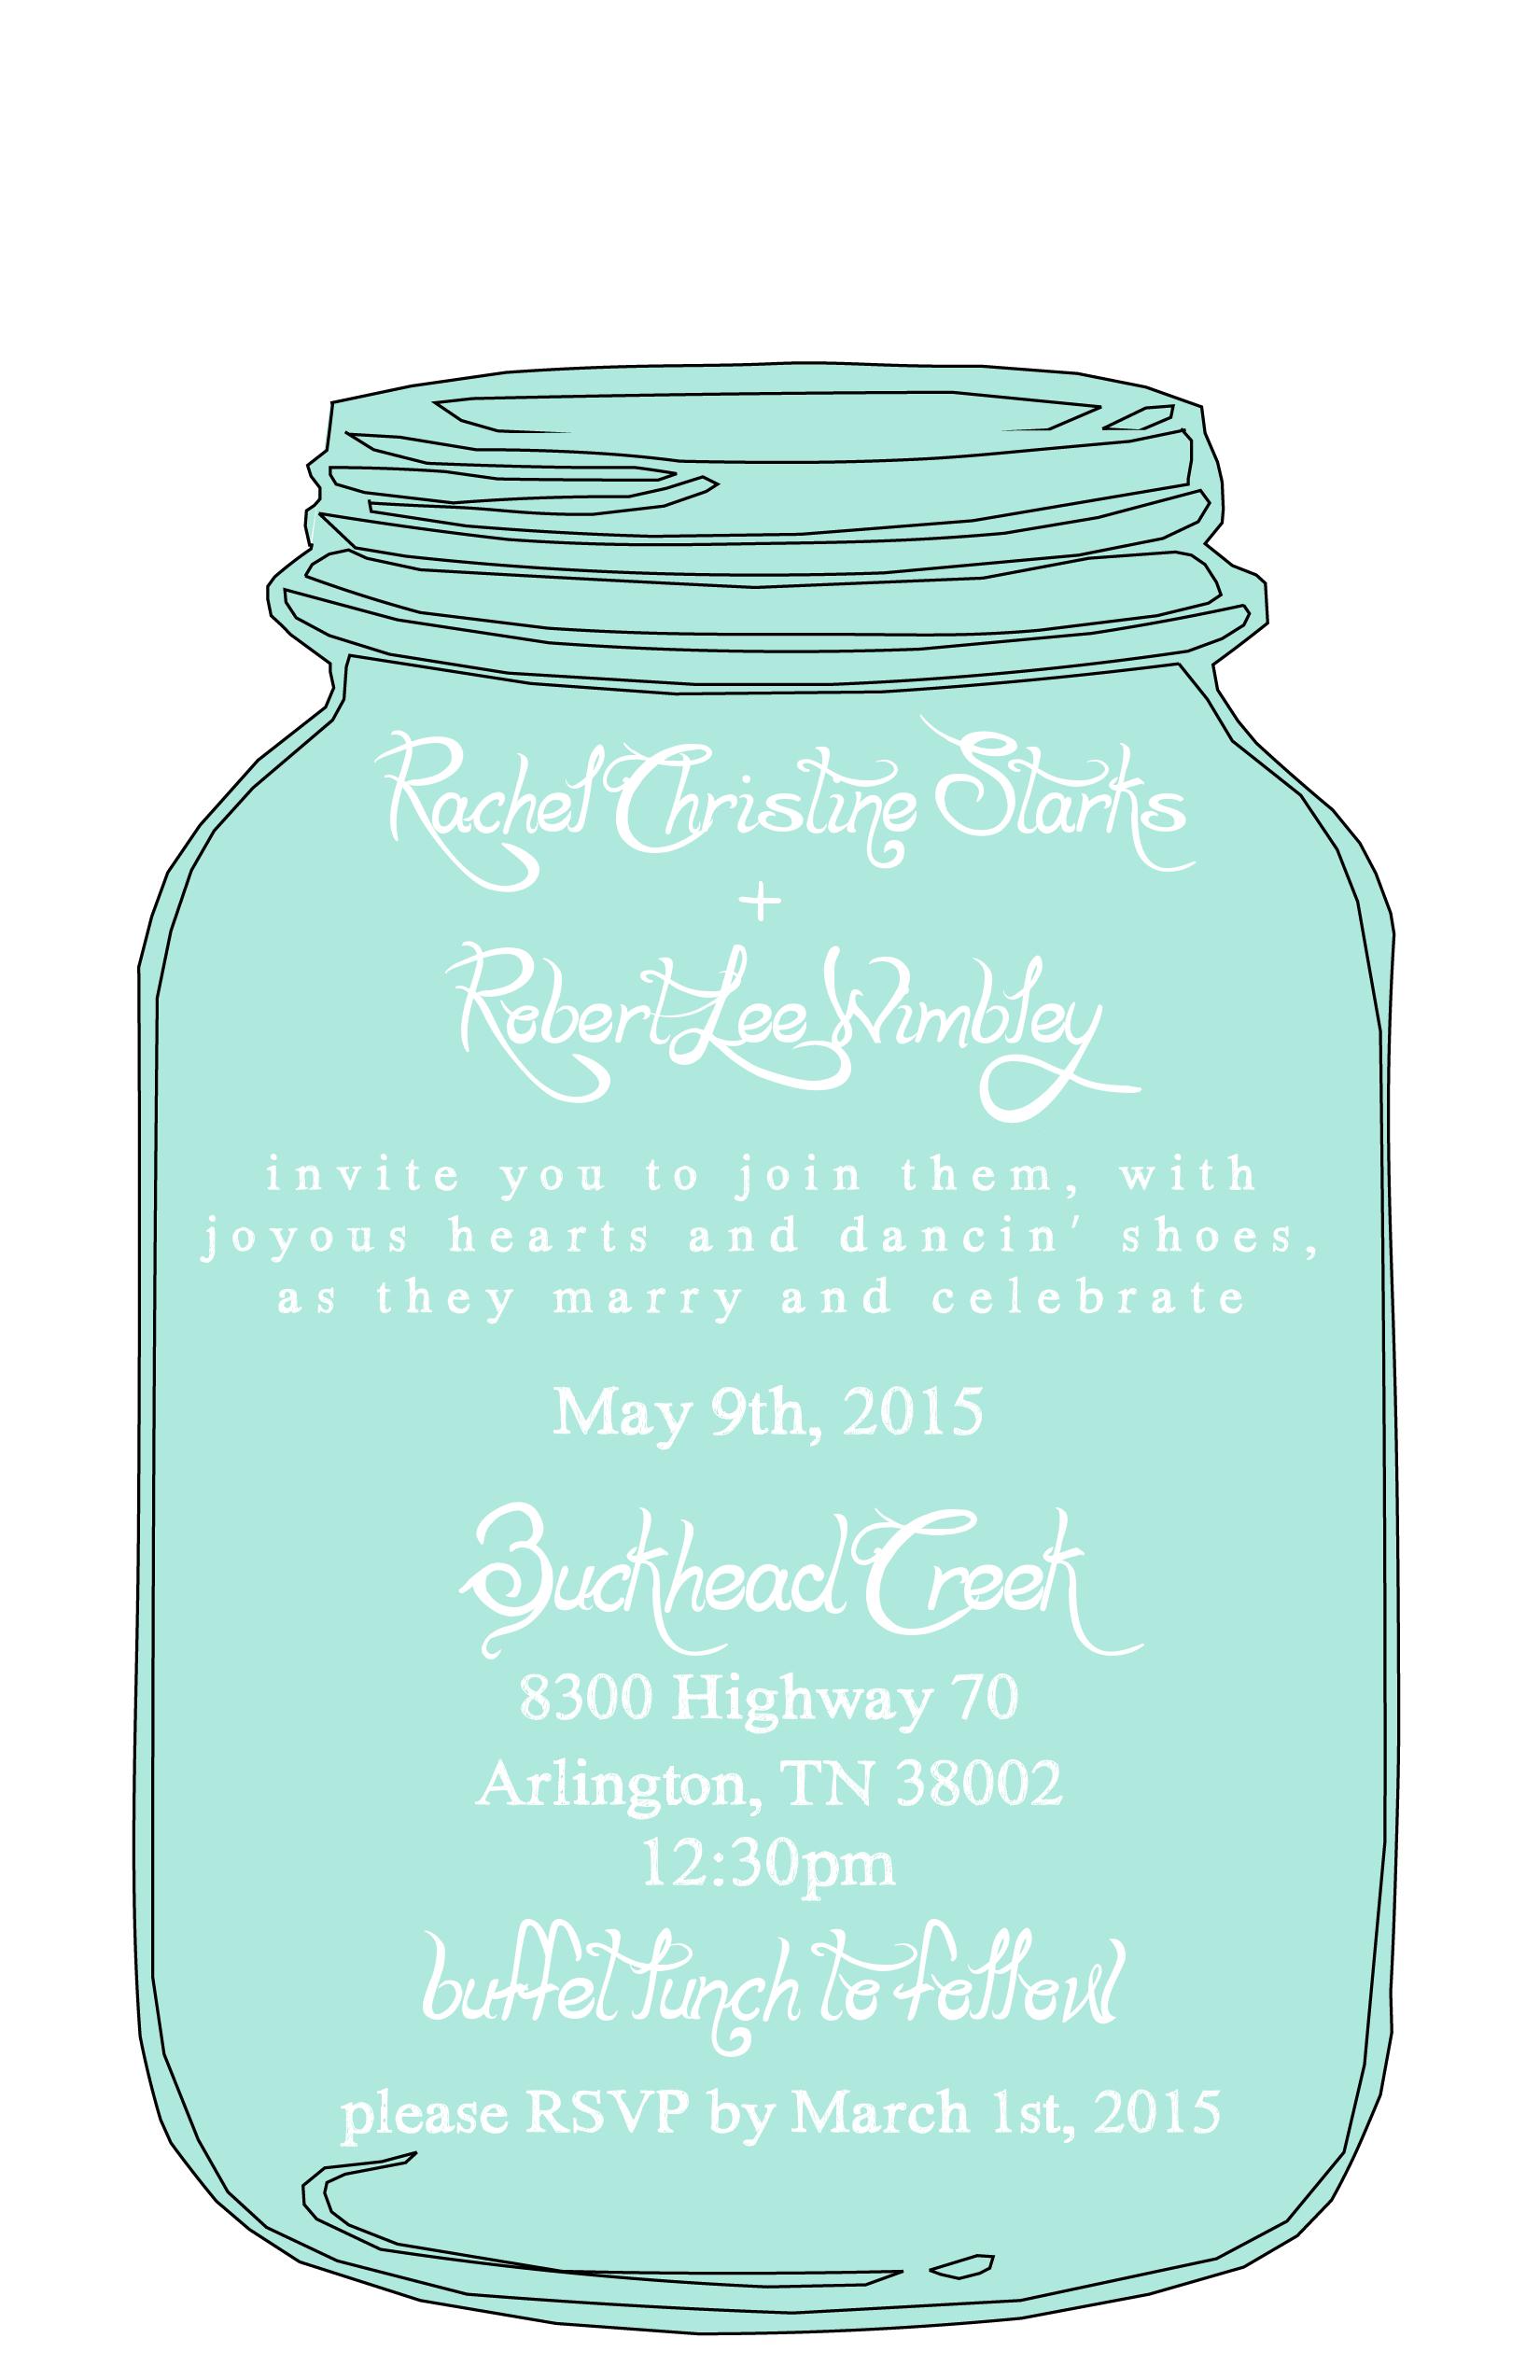 Floral Wreath Free Printable Bridal Shower Invitation Suite - Free Mason Jar Wedding Invitation Printable Templates